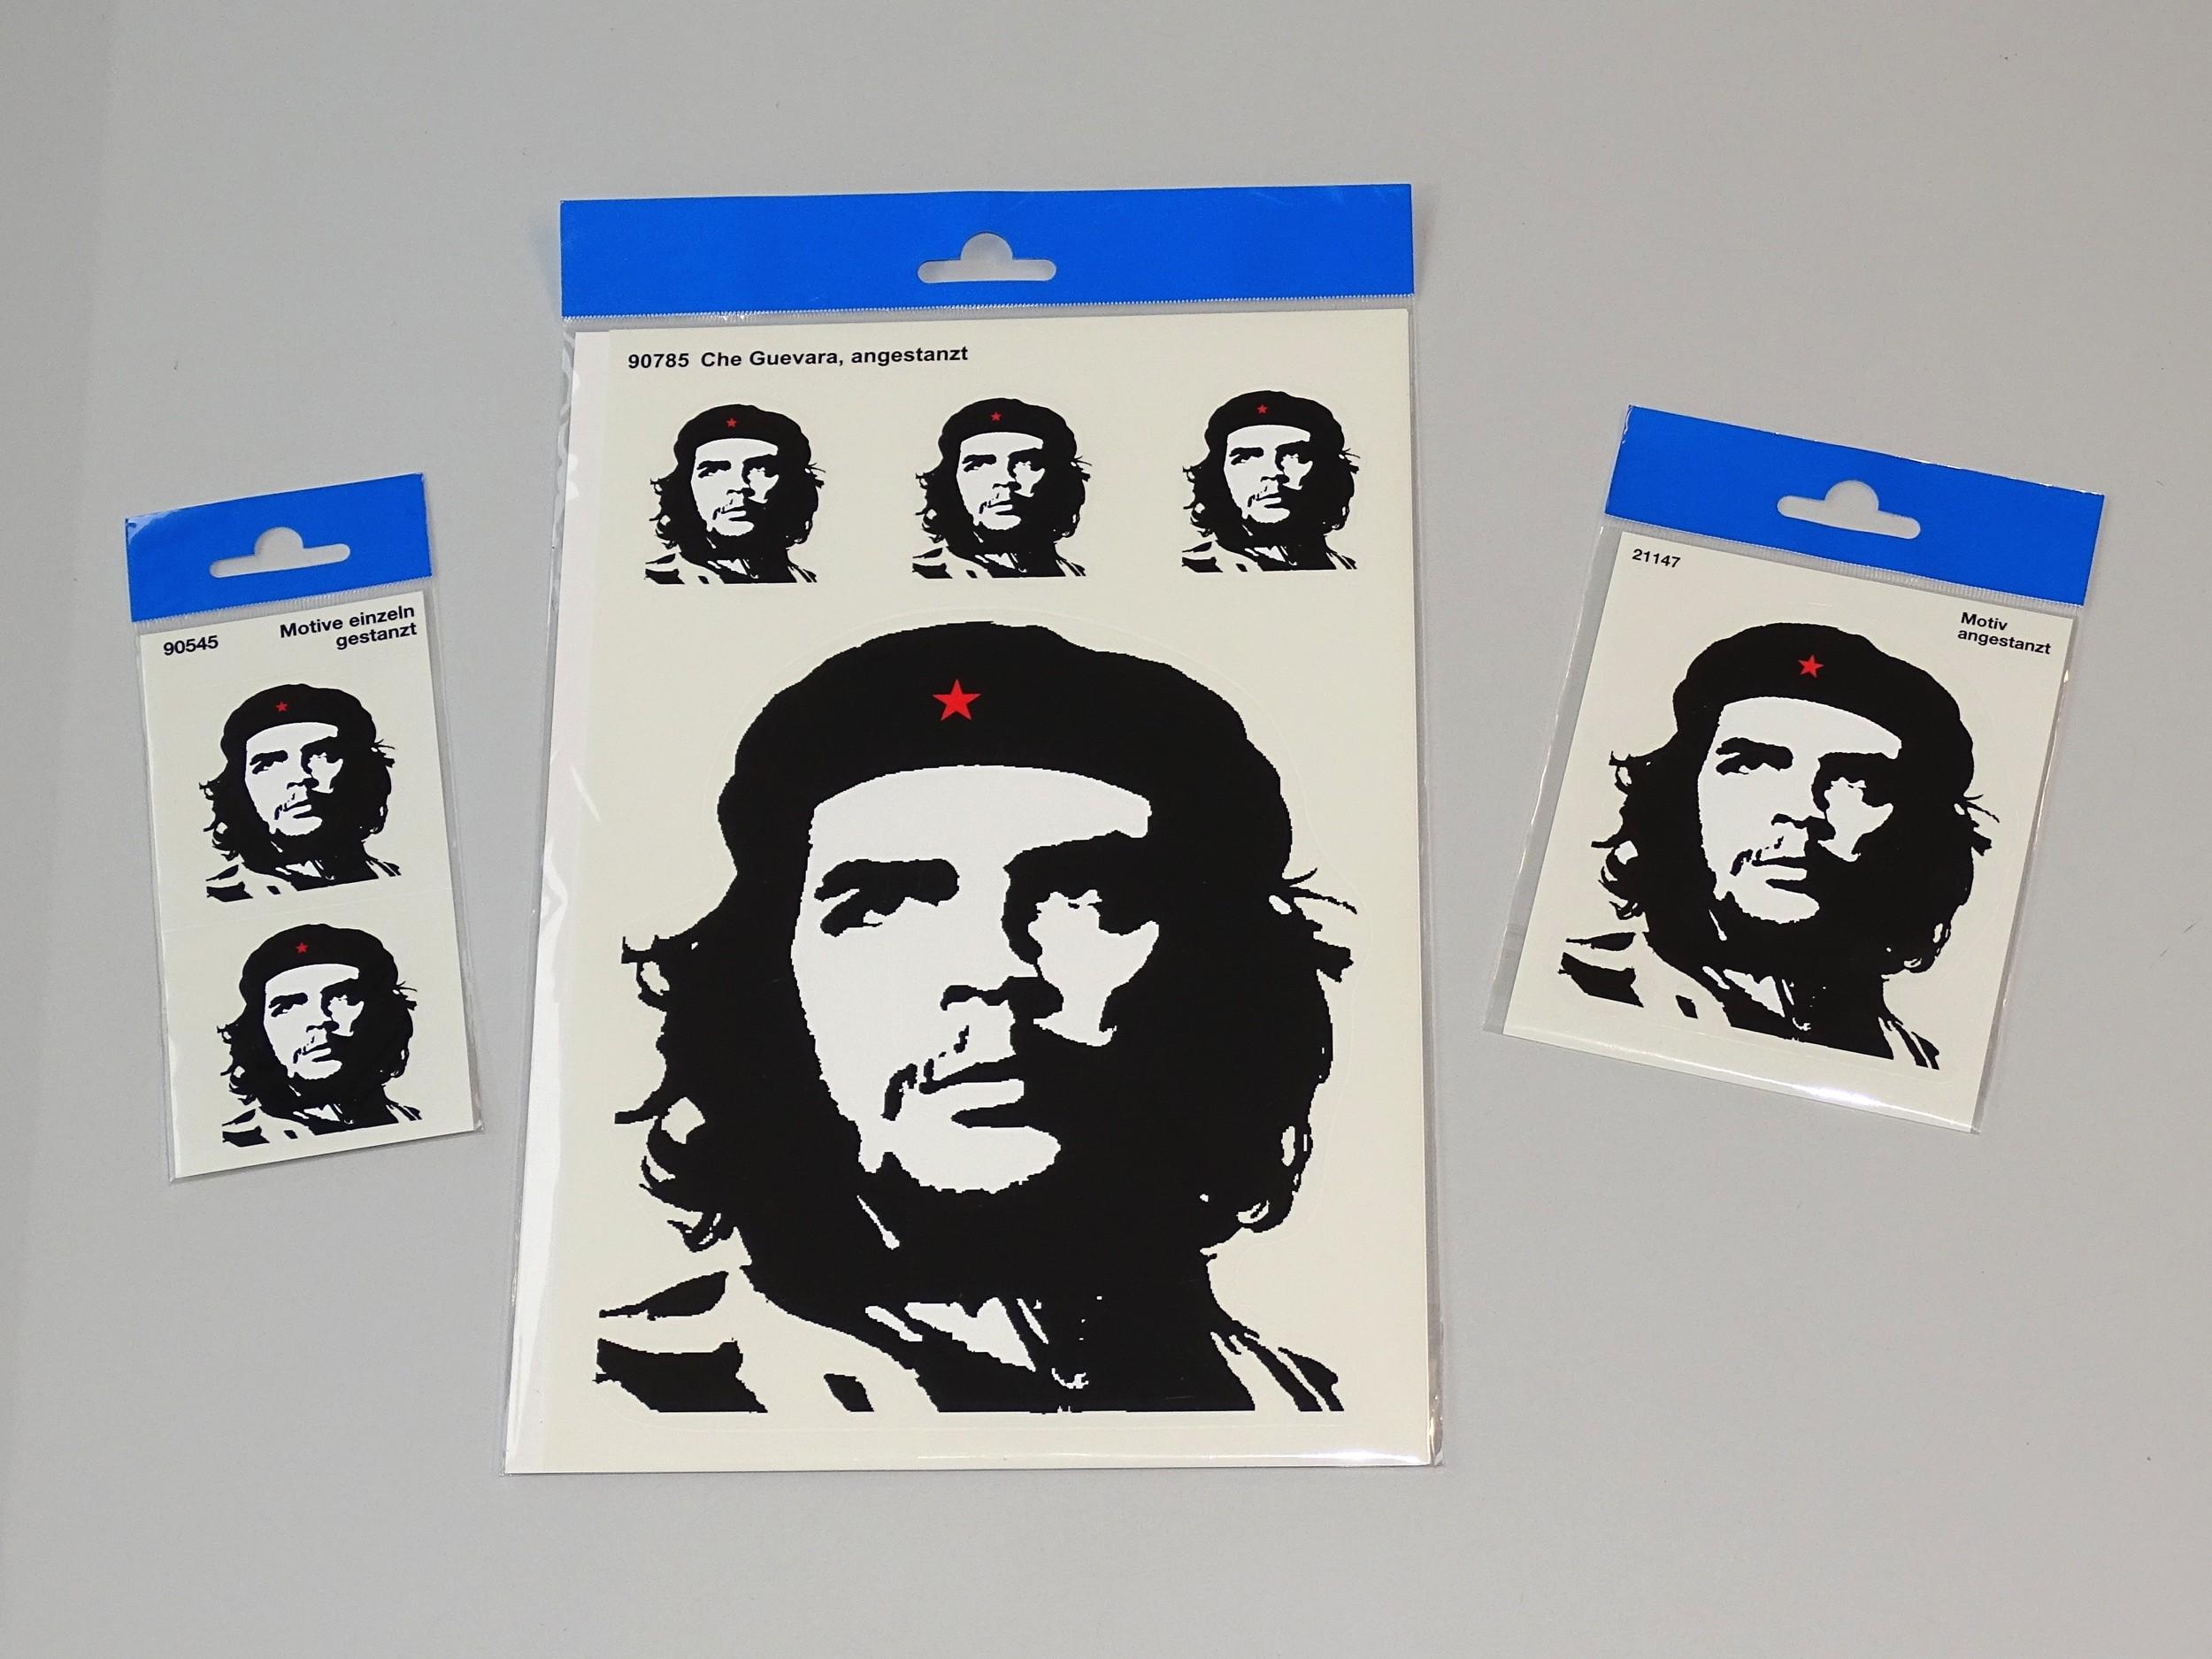 Contours d'autocollant Che Guevara 135 x 110 mm – Bild 2